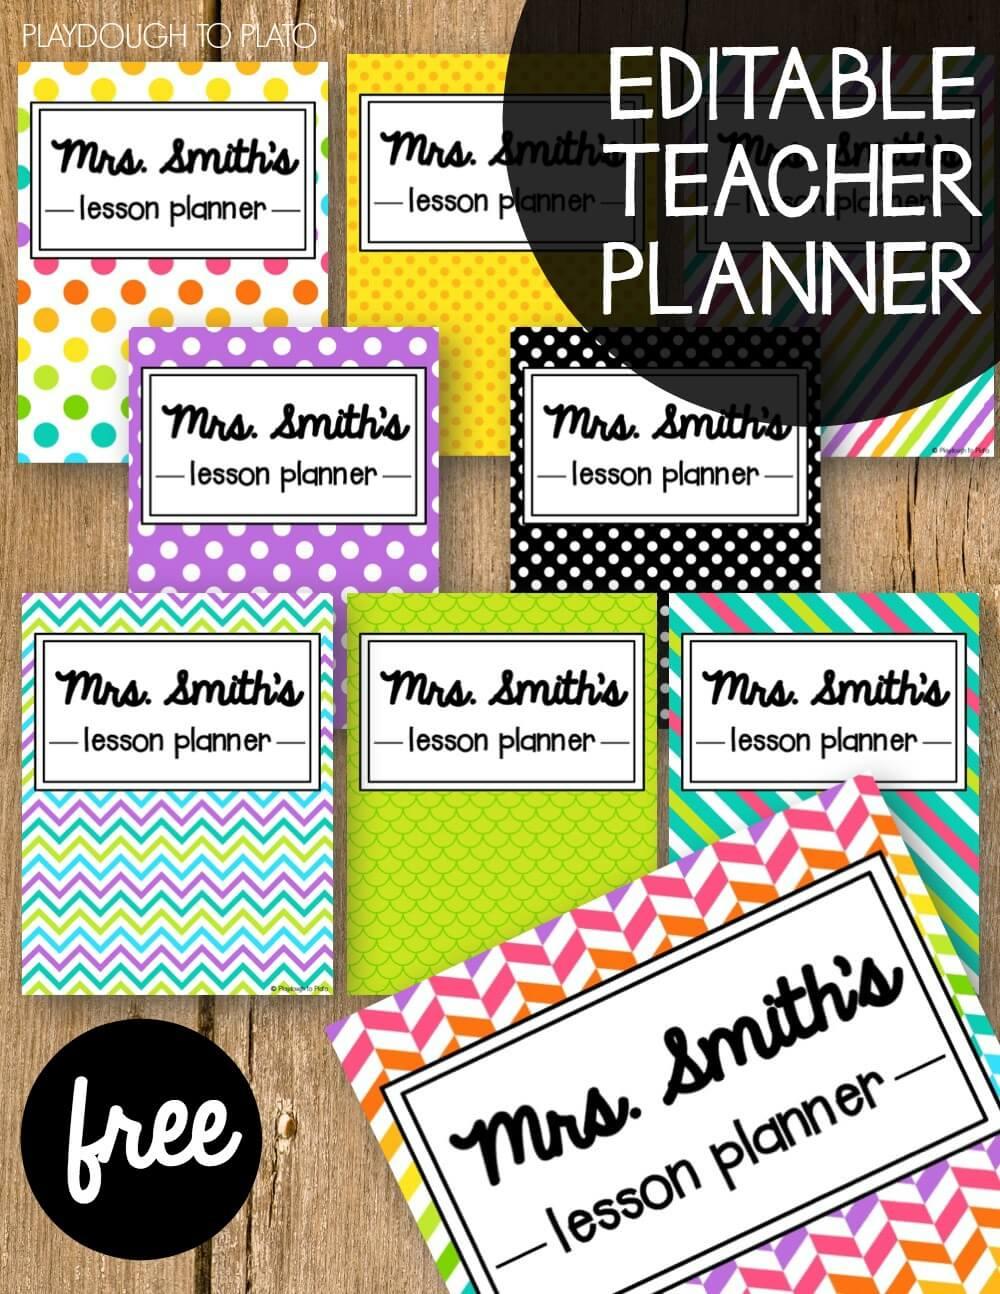 Free Teacher Planner - Playdough To Plato - Free Printable Teacher Planner